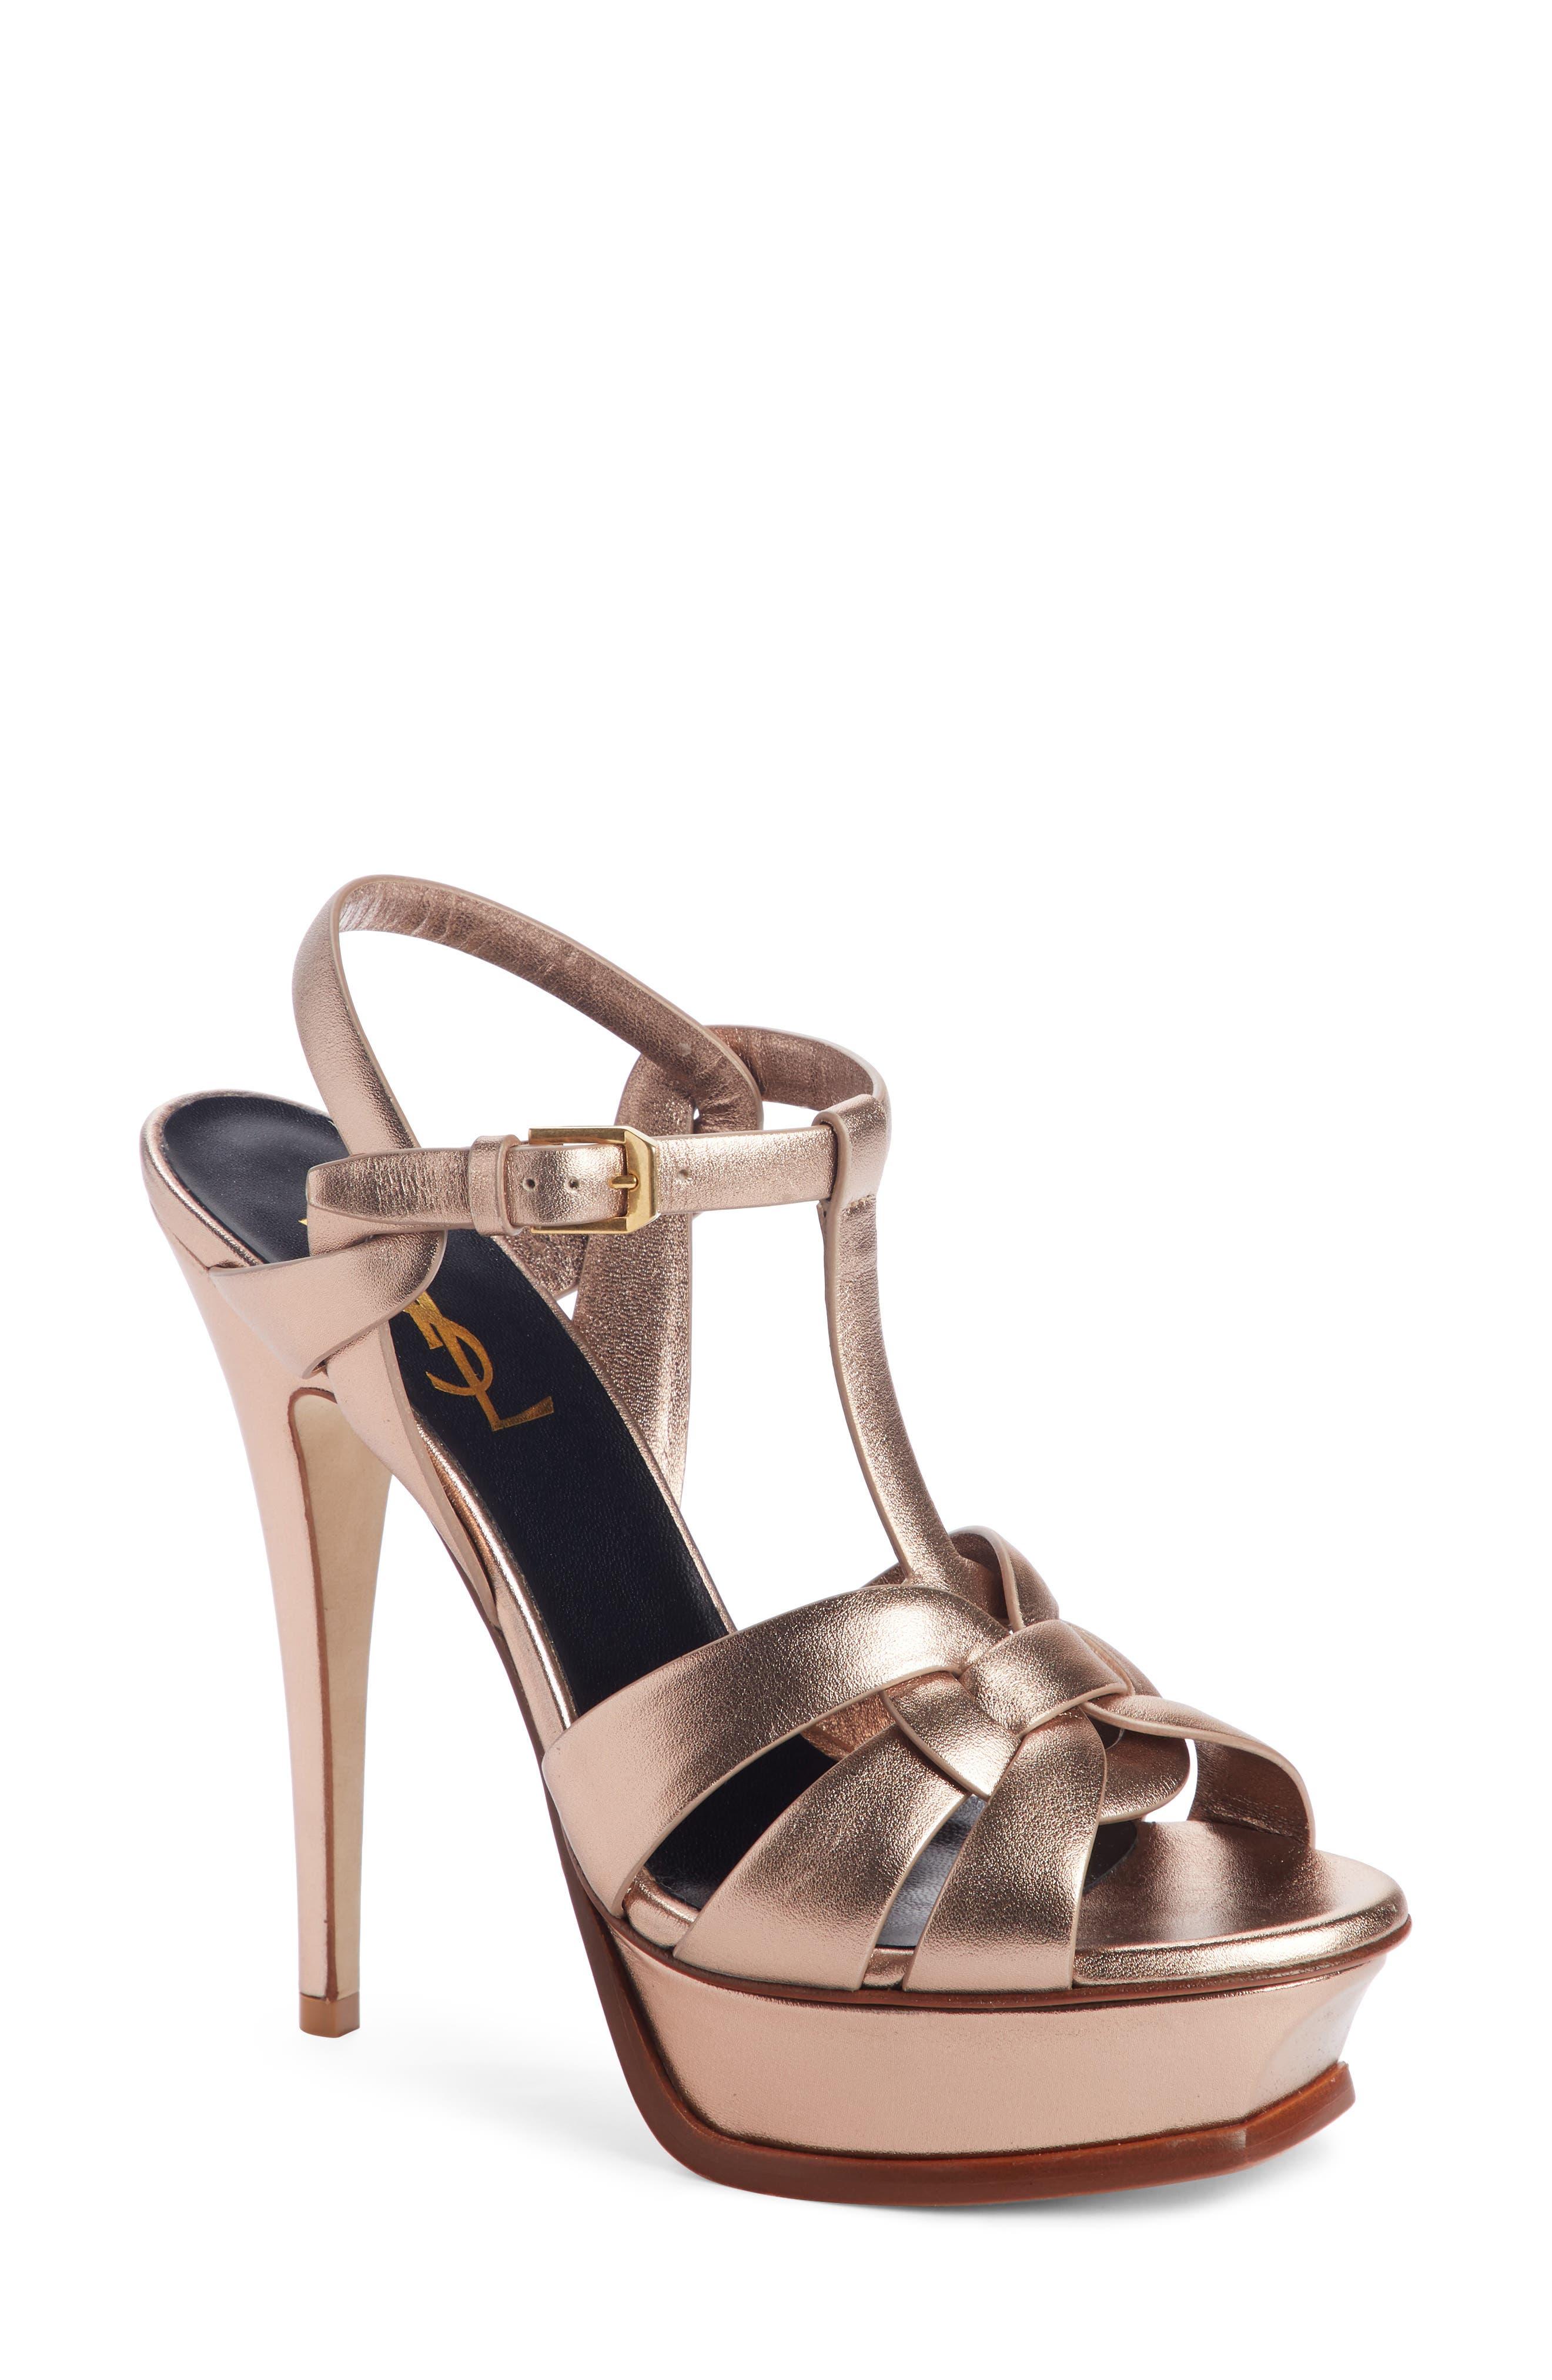 SAINT LAURENT Tribute Metallic Platform Sandal, Main, color, BLUSH METAL